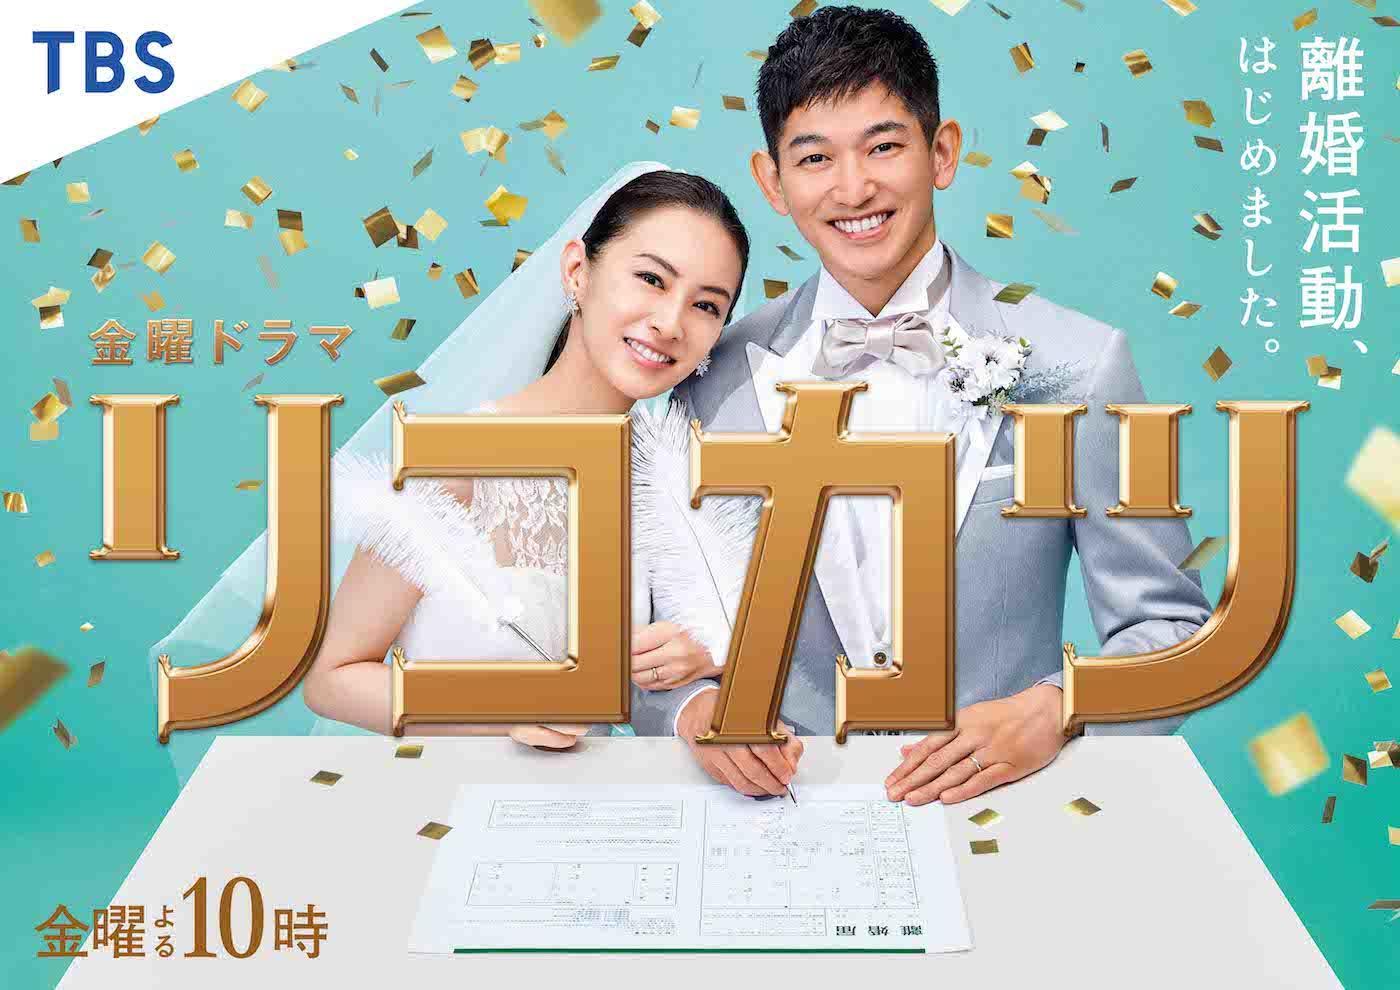 TBS系金曜ドラマ『リコカツ』